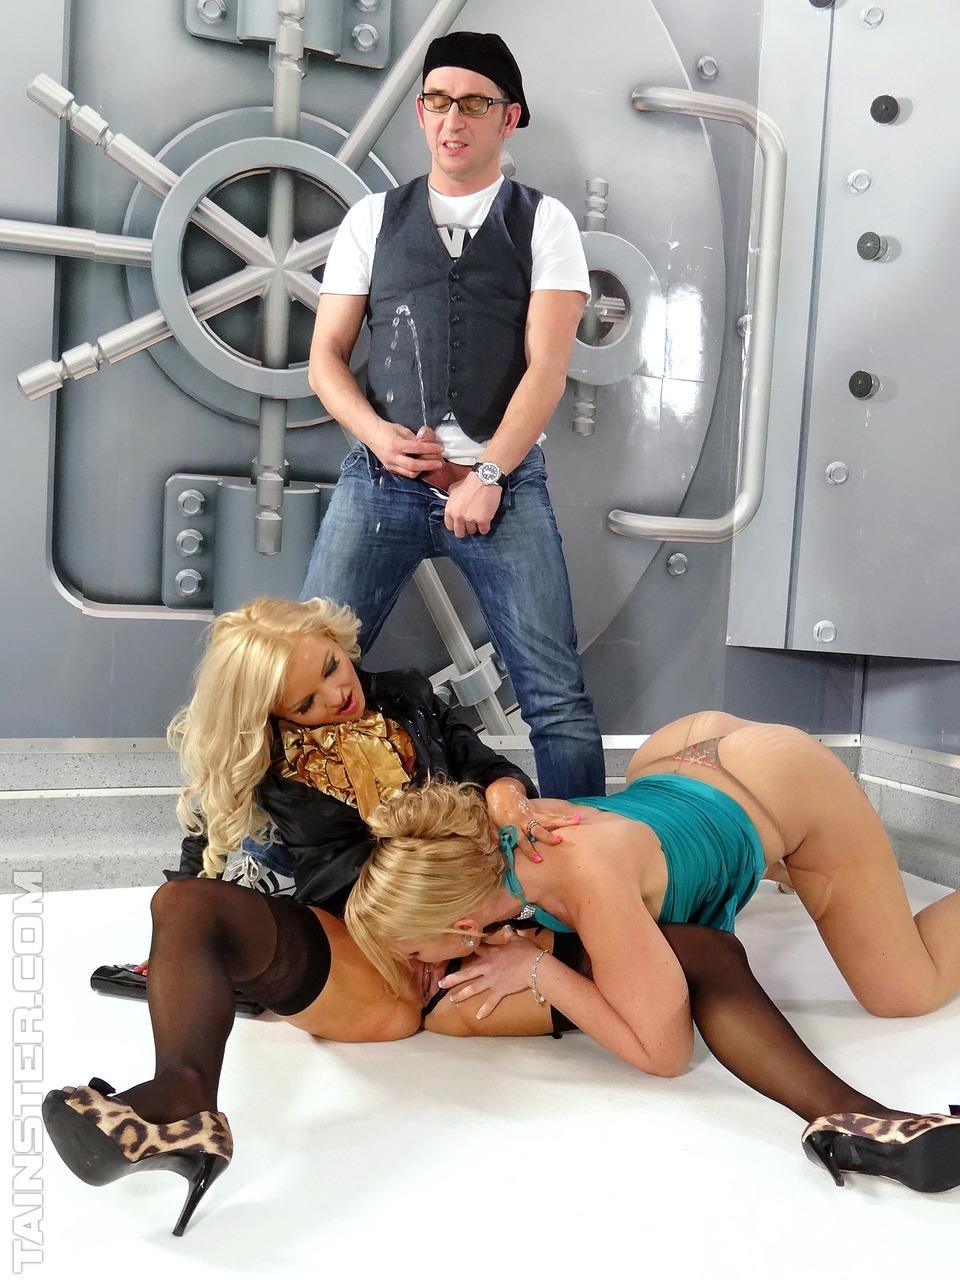 Фотограф затеял со шмонями около хранилища в банке. Фото - 5